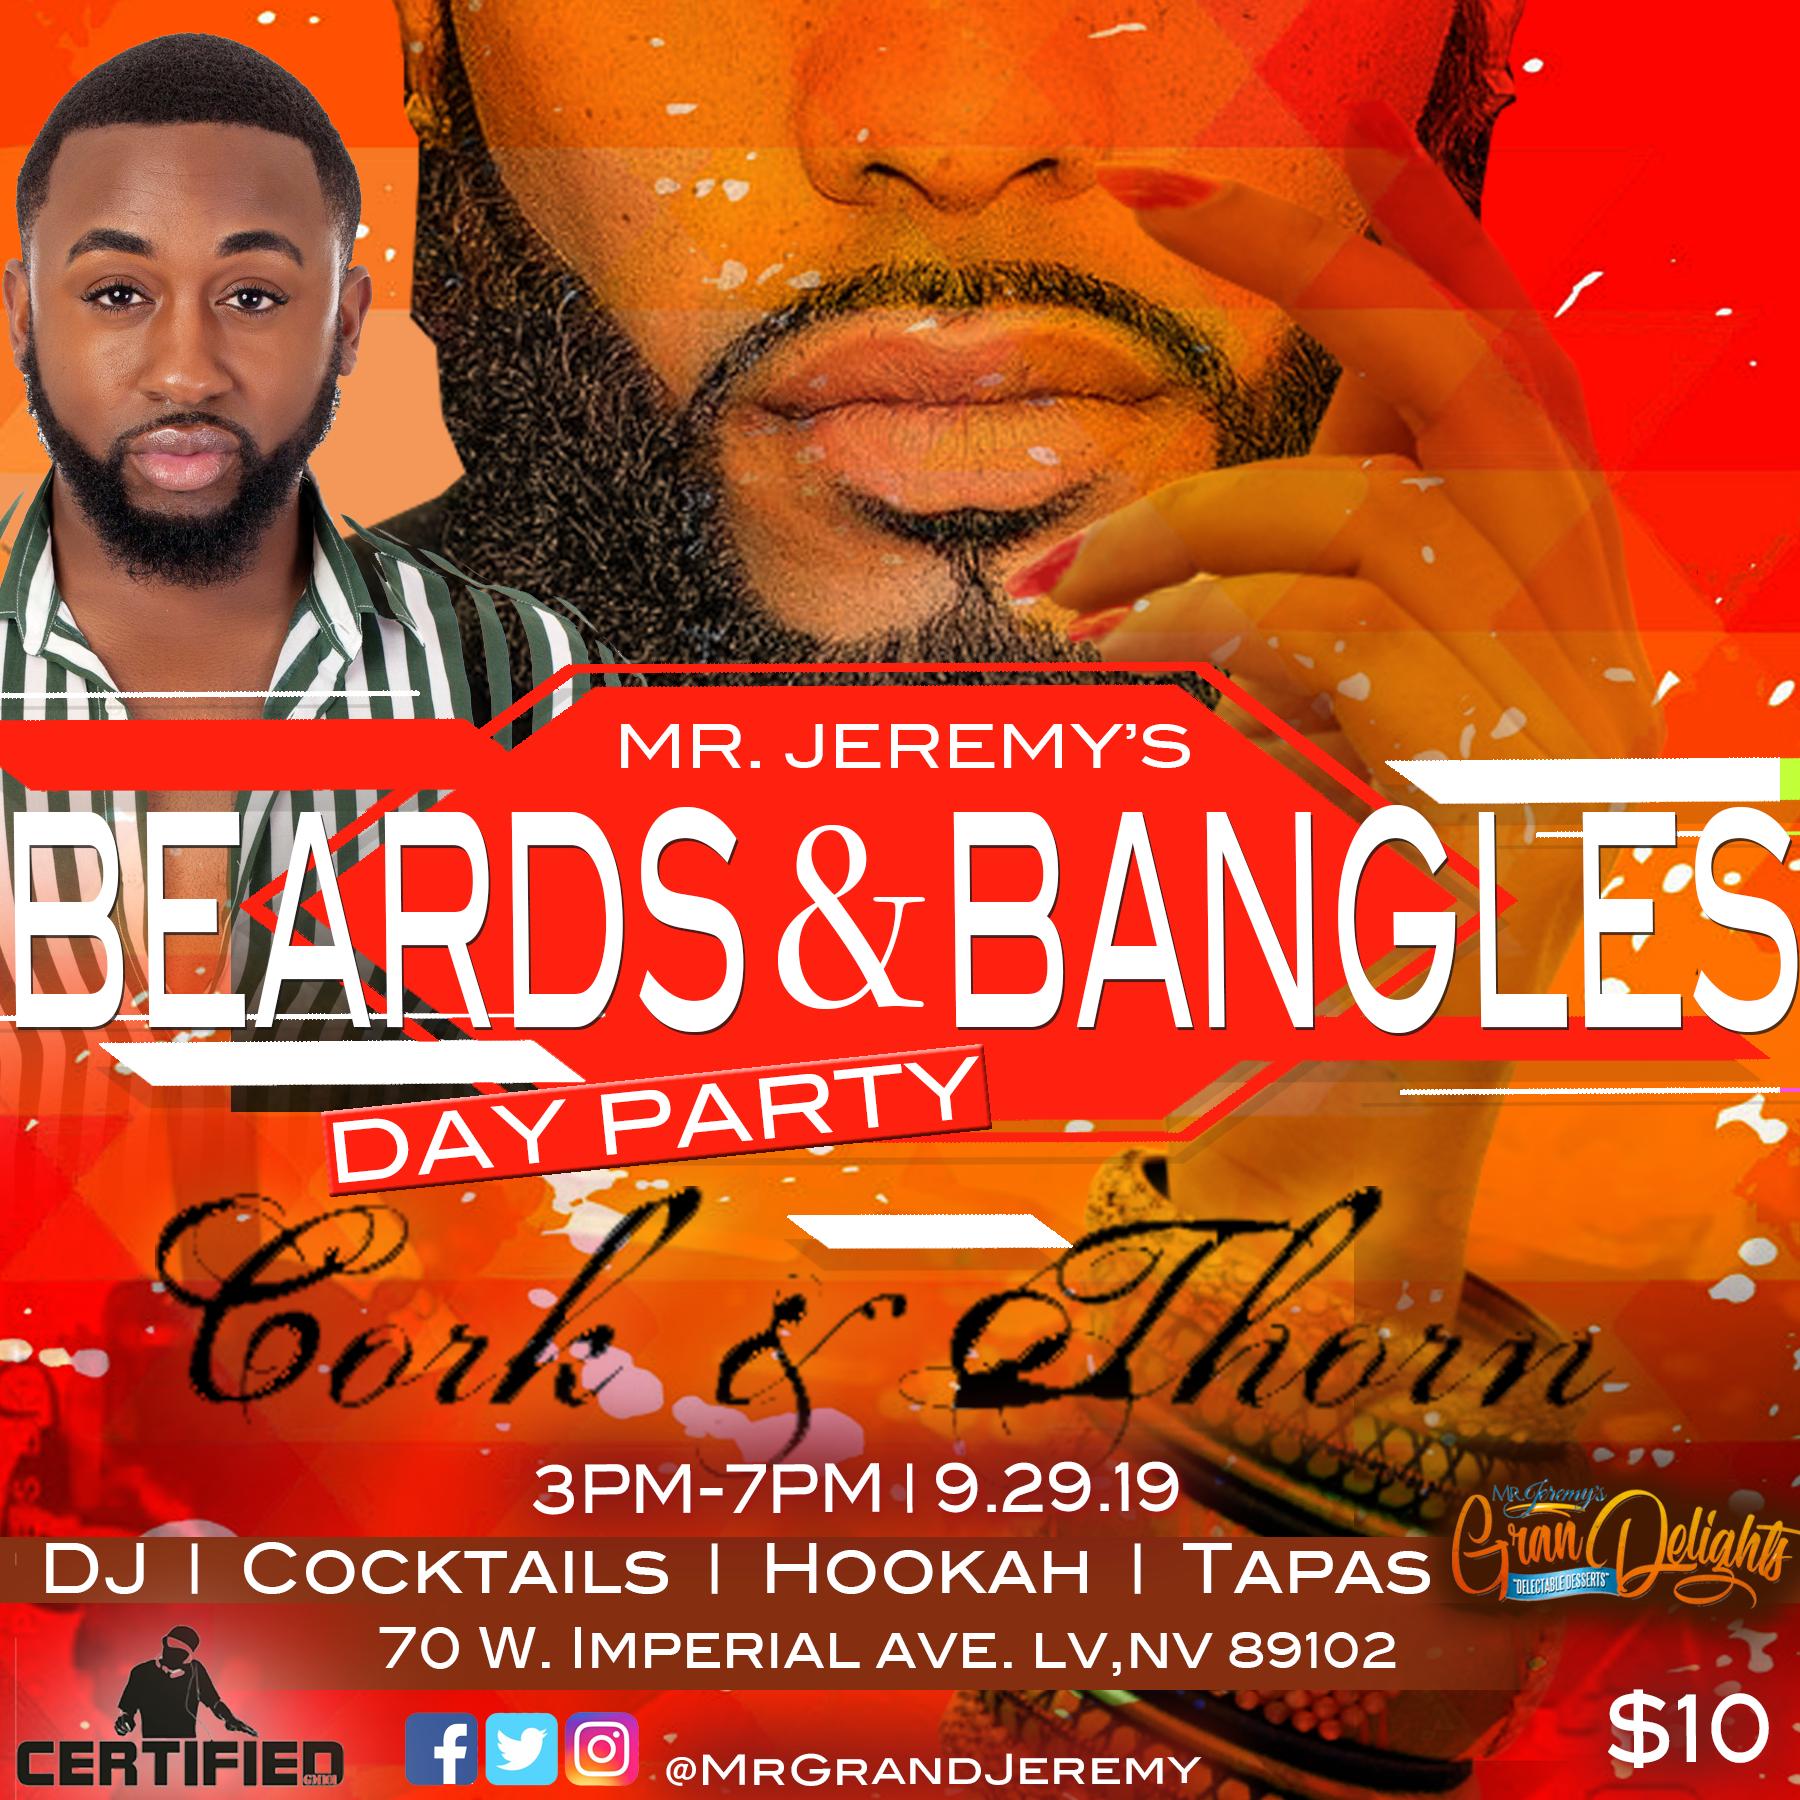 BeardsBangles